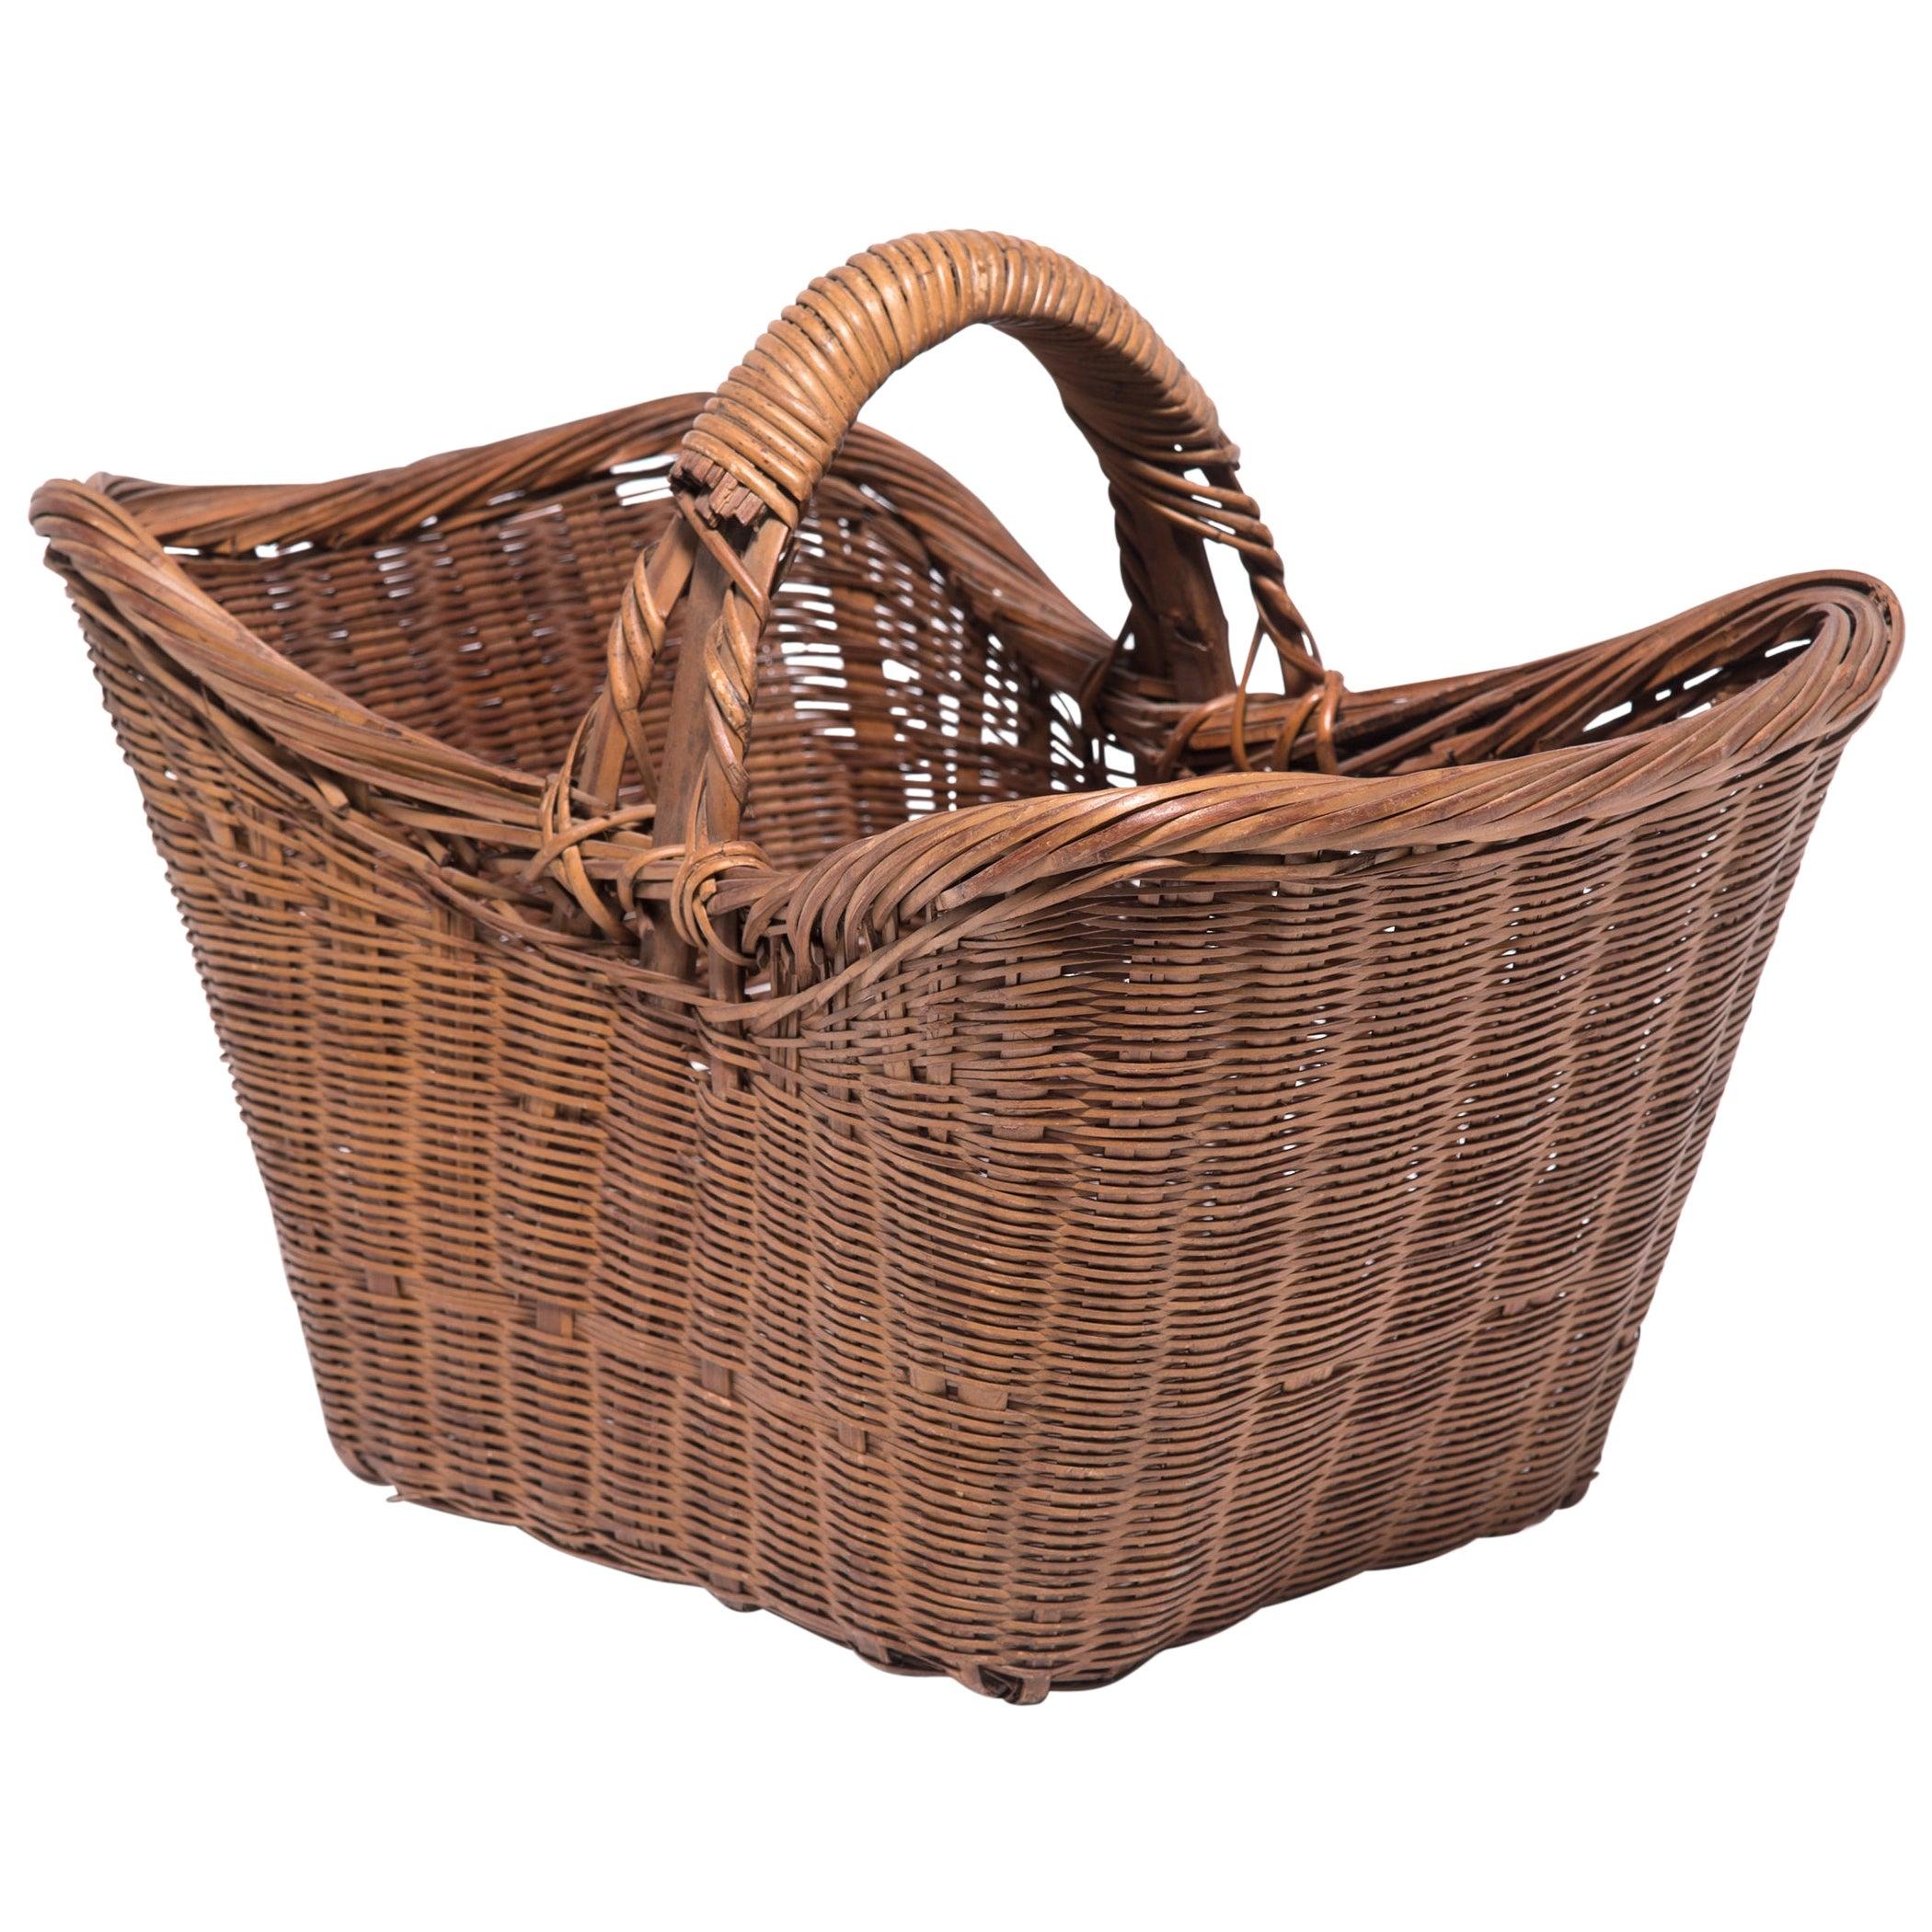 Vintage Chinese Twist Woven Market Basket